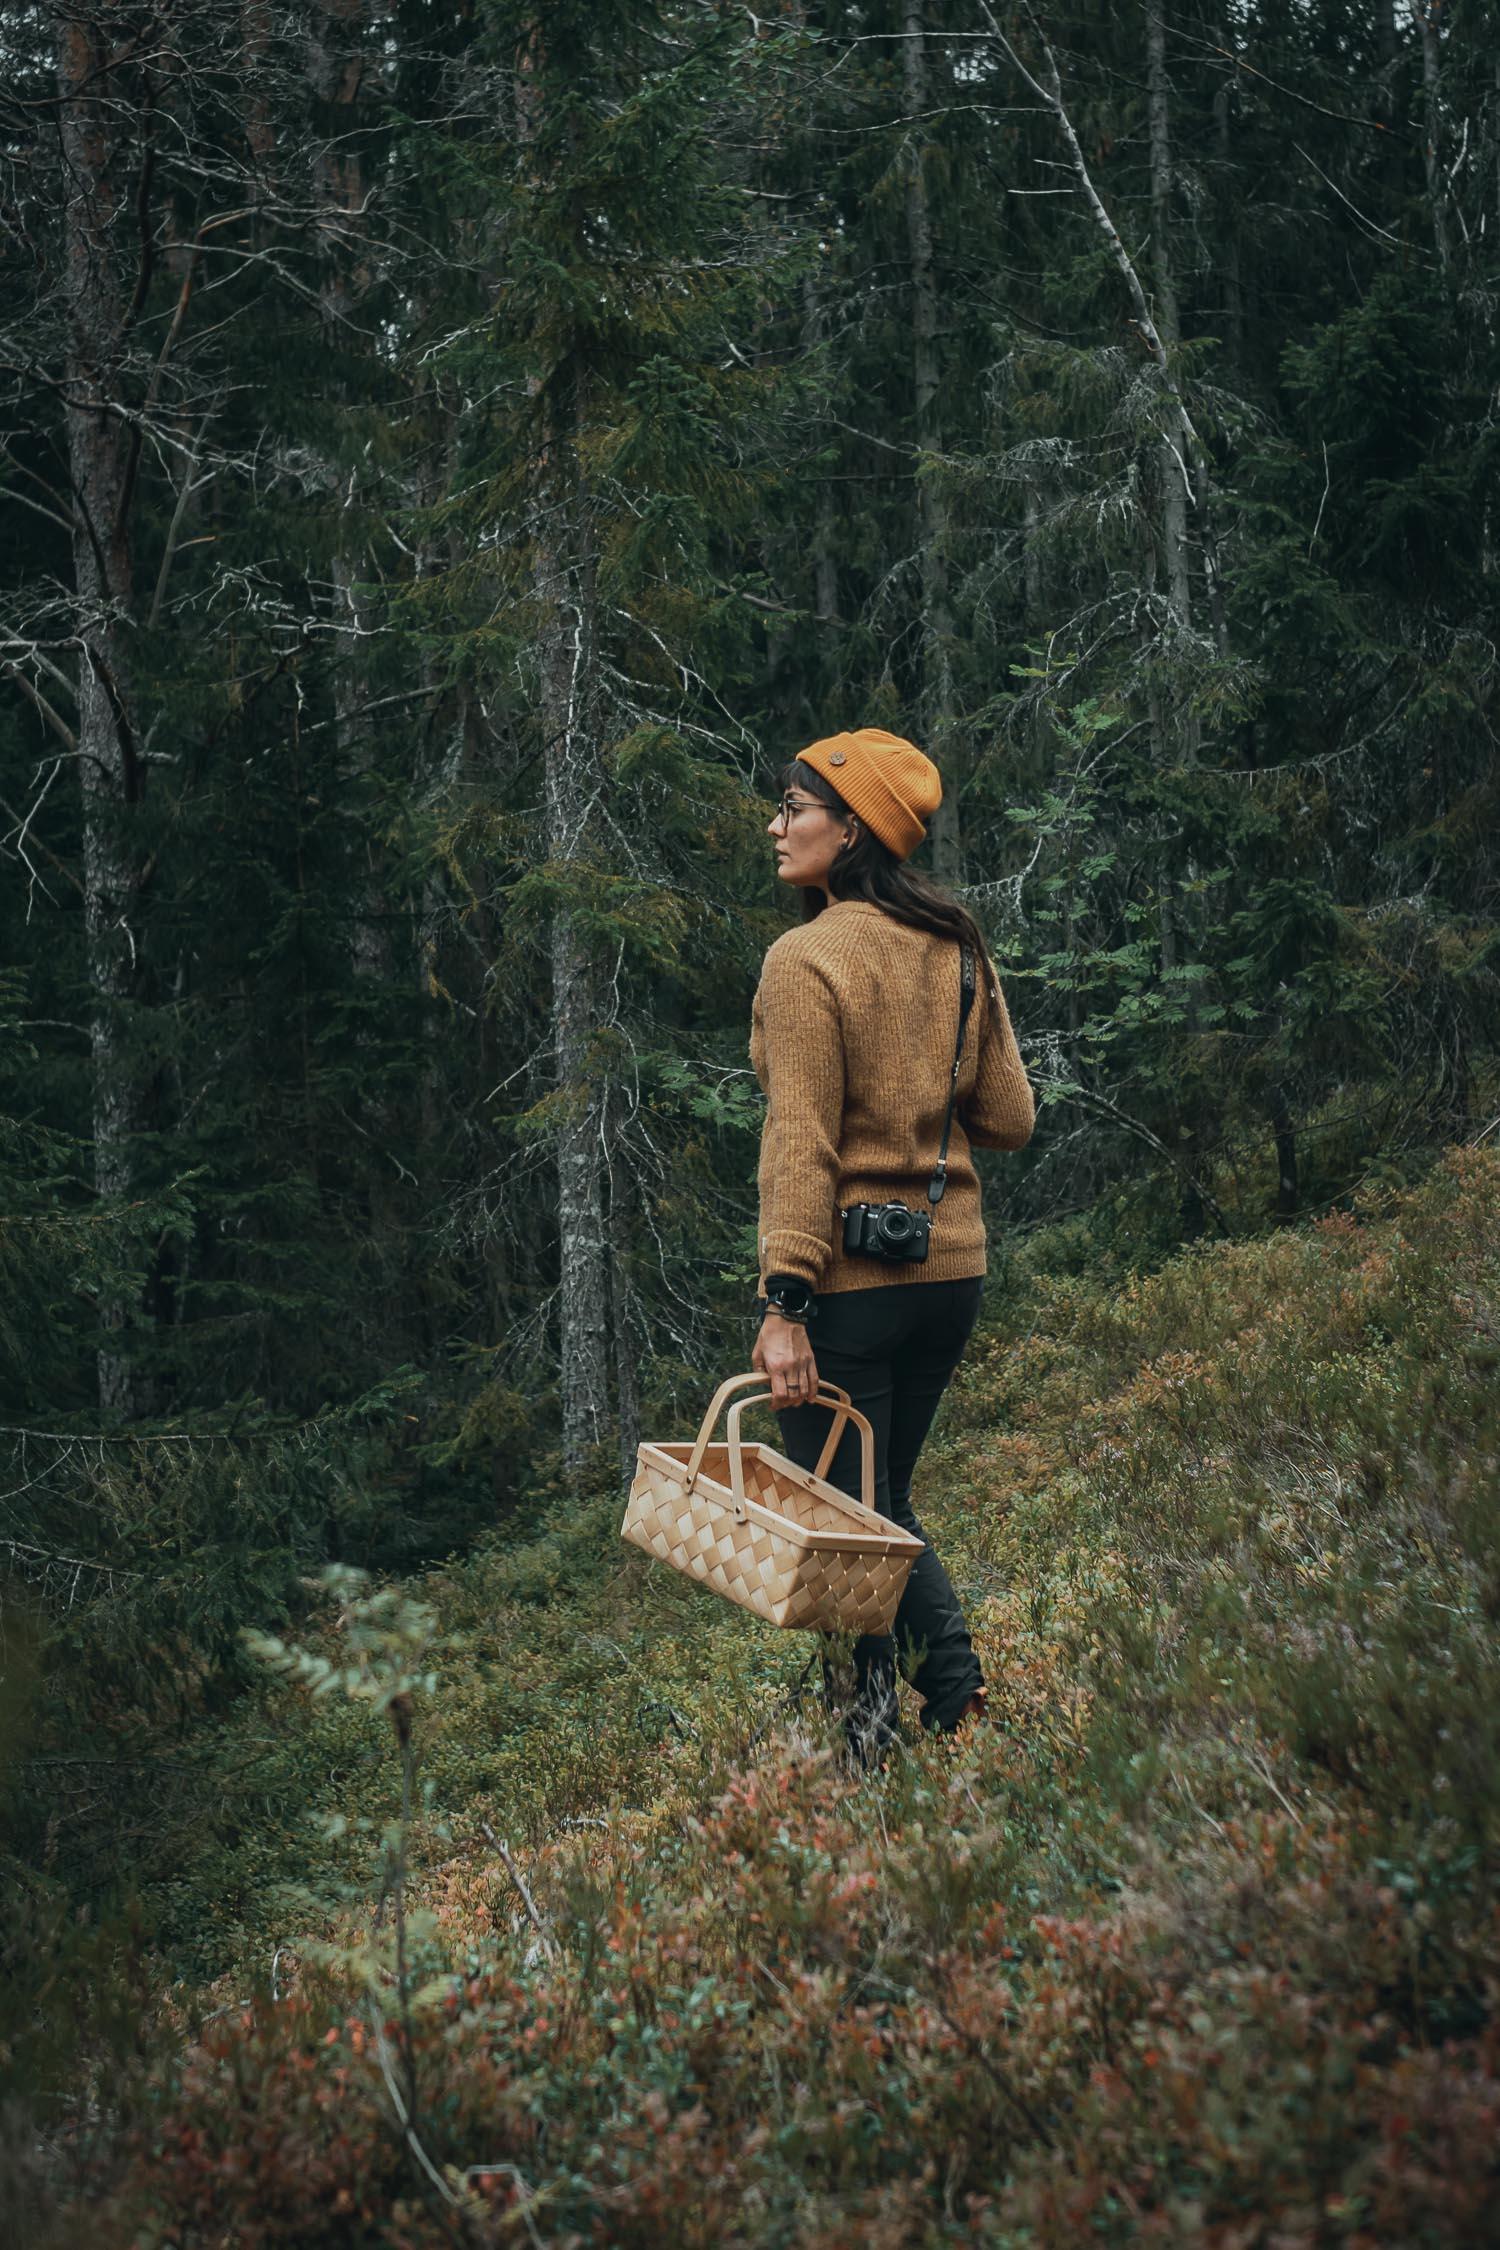 woman mushroom picking